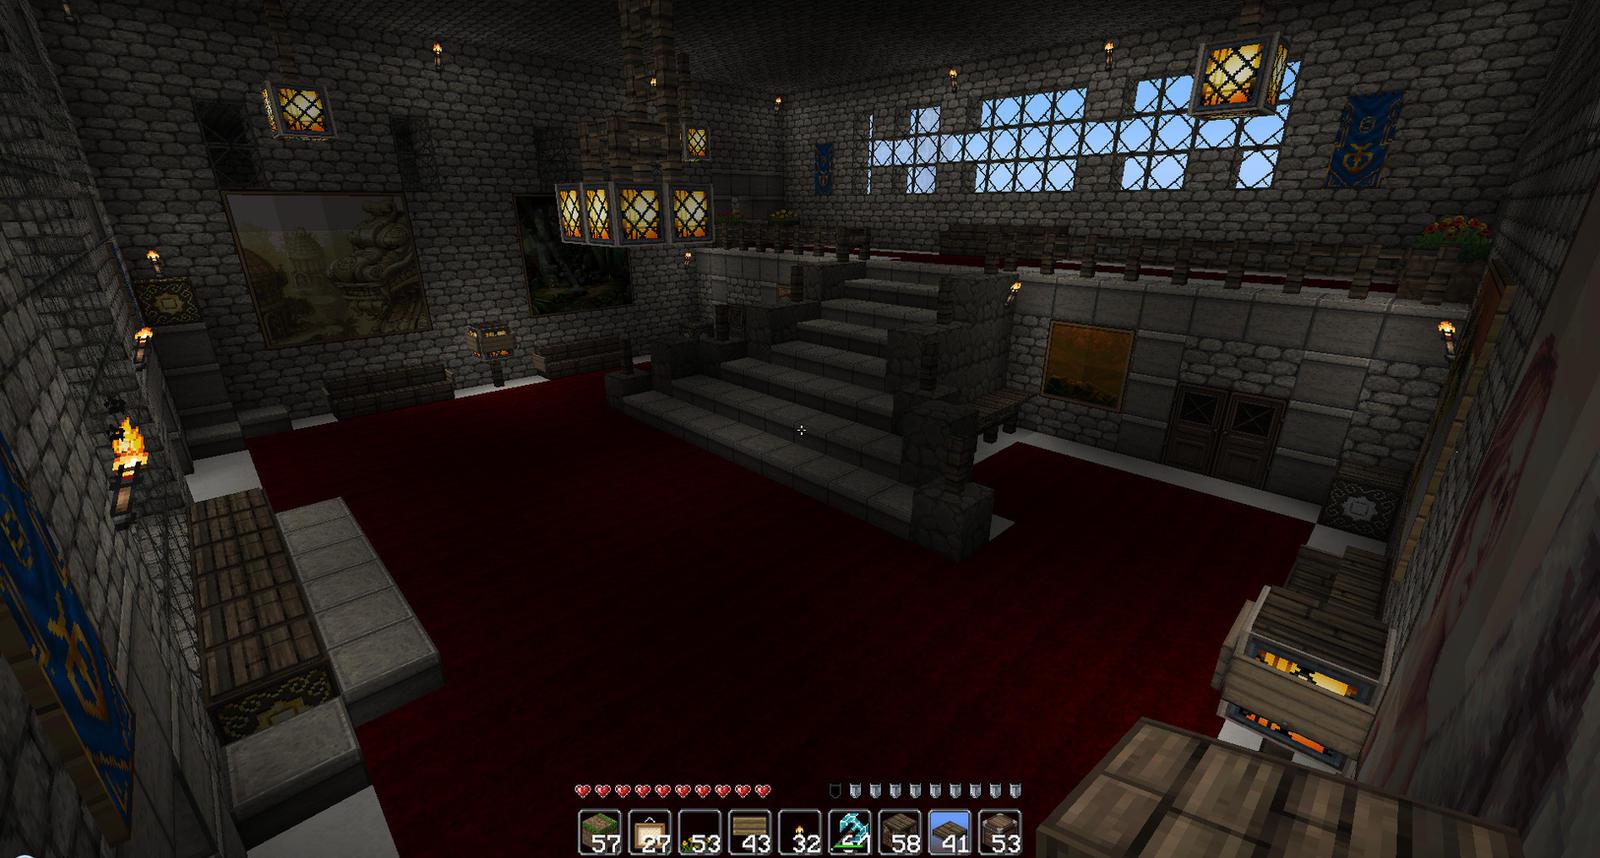 Castle Entrance Hall 2 by oddworld90 on deviantART